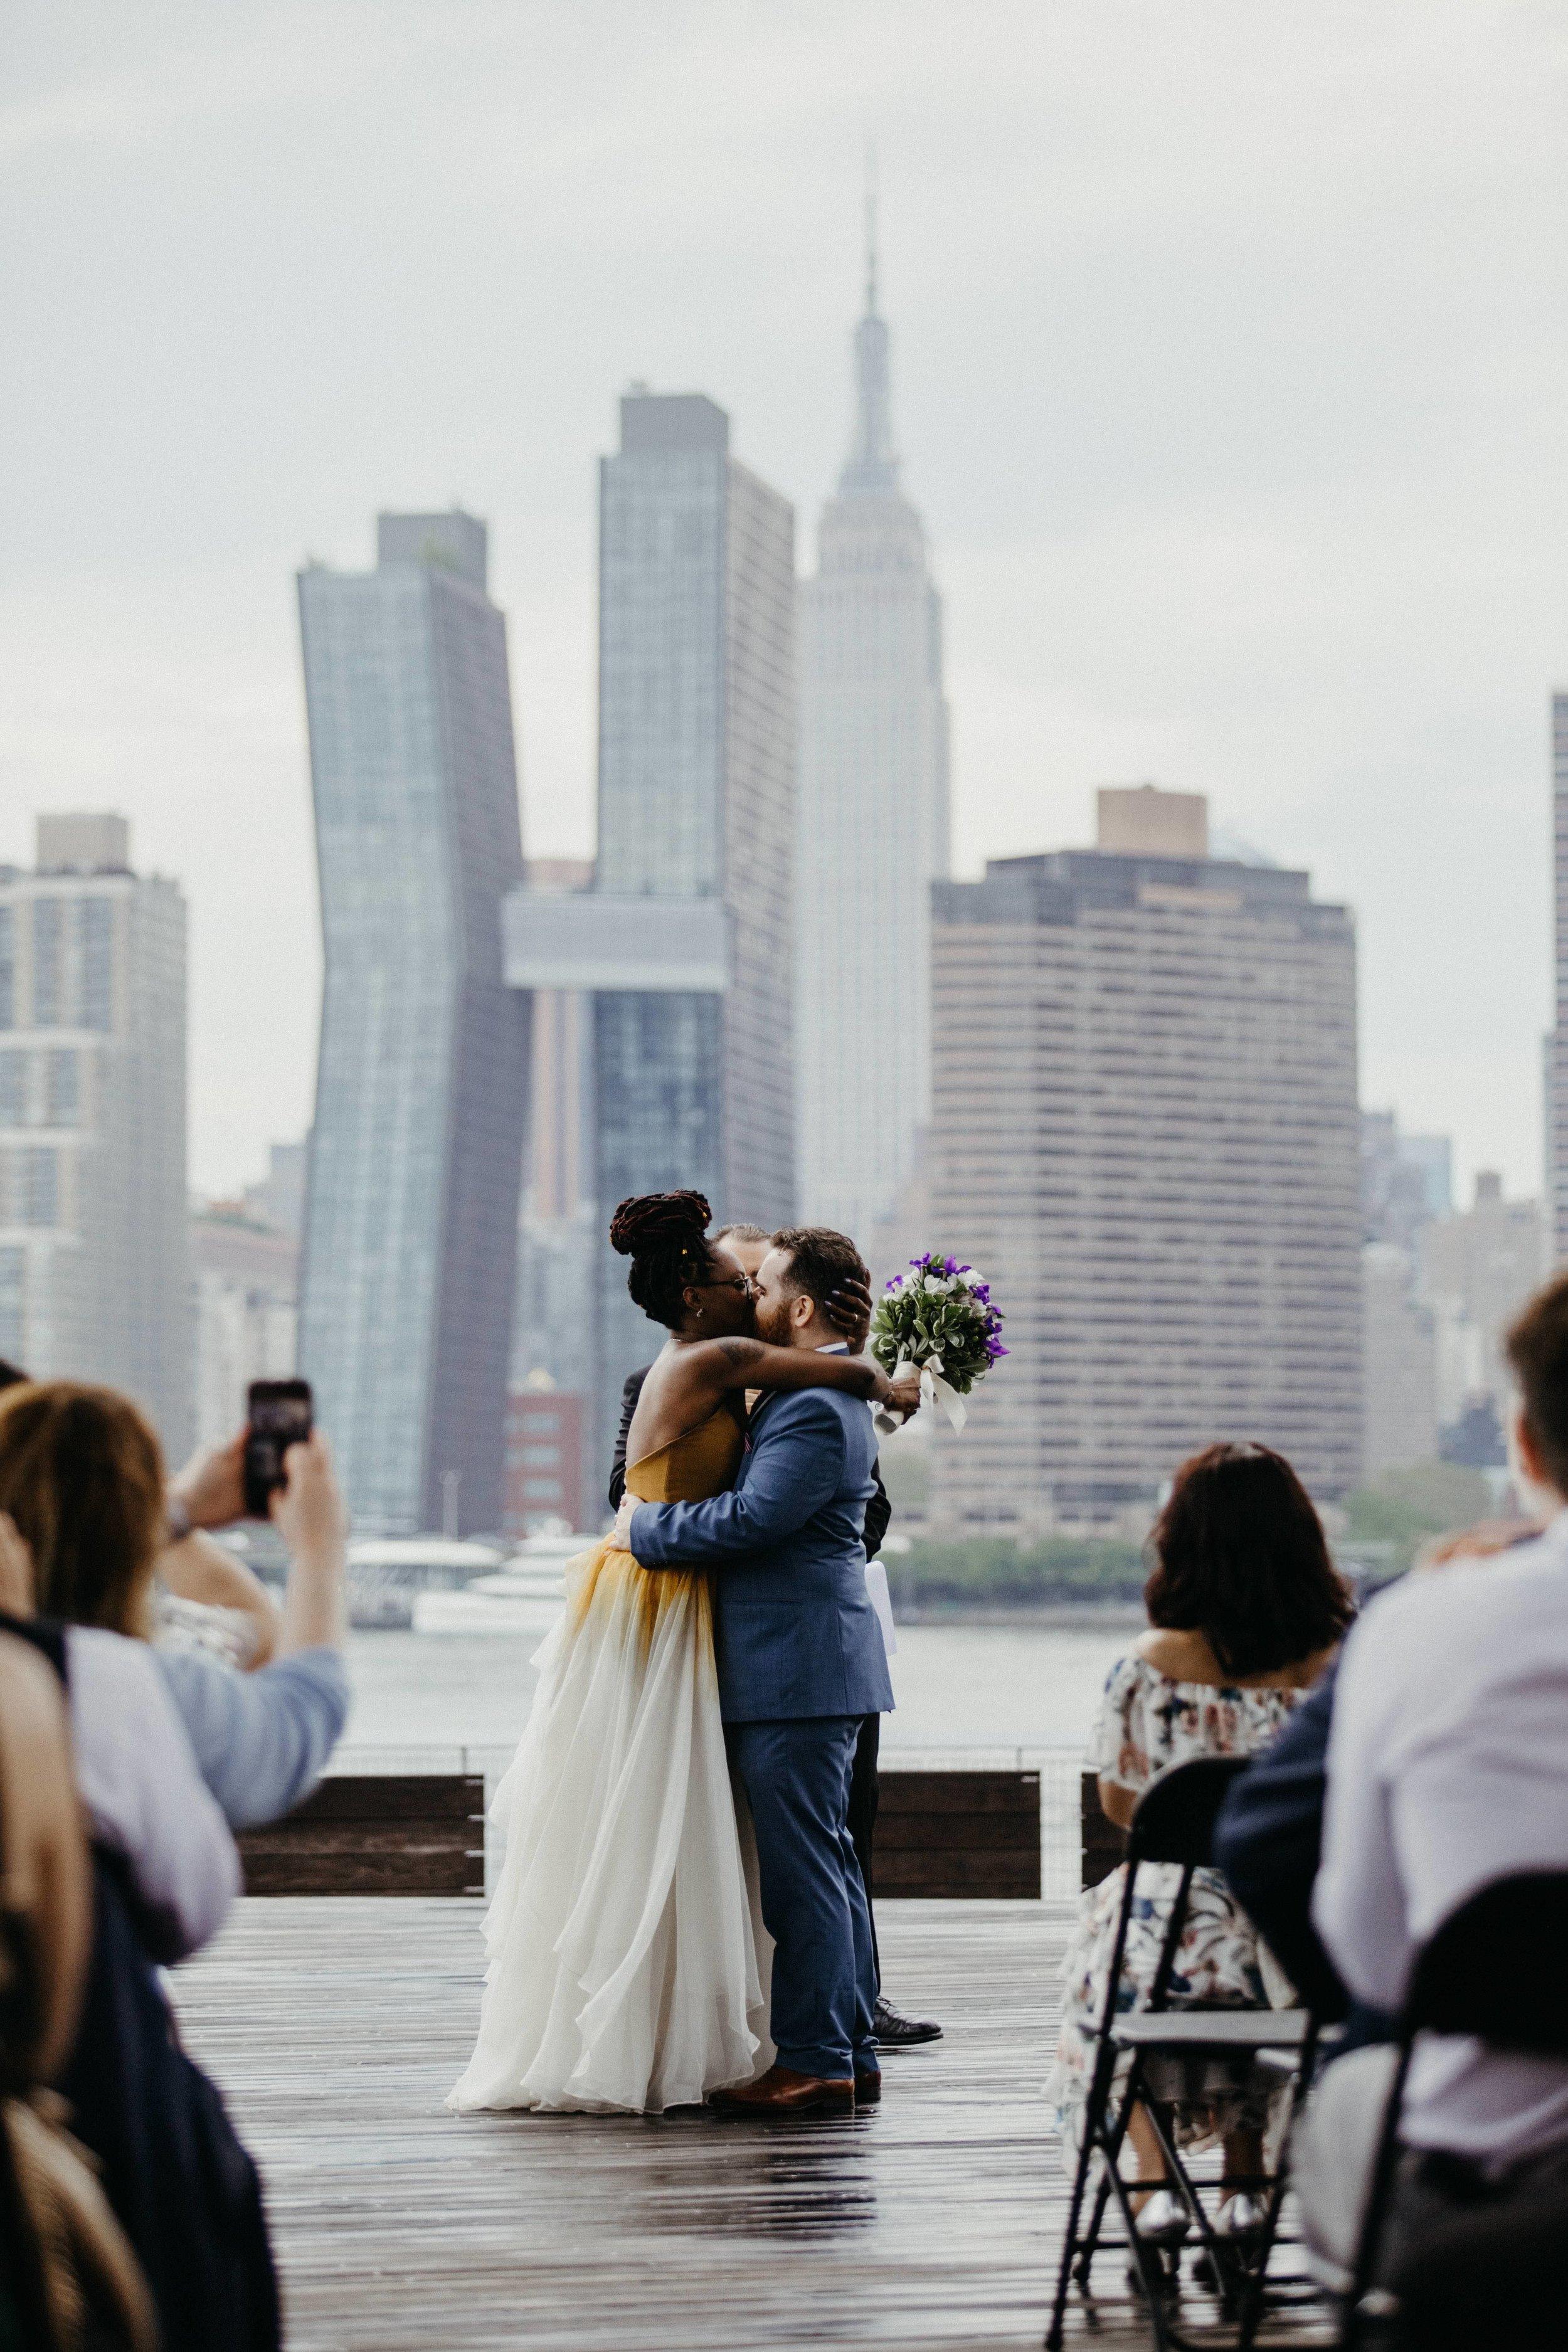 Sevlynn-Photography-Wedding-LIC-Landing-Maiella-NYC-43.jpg